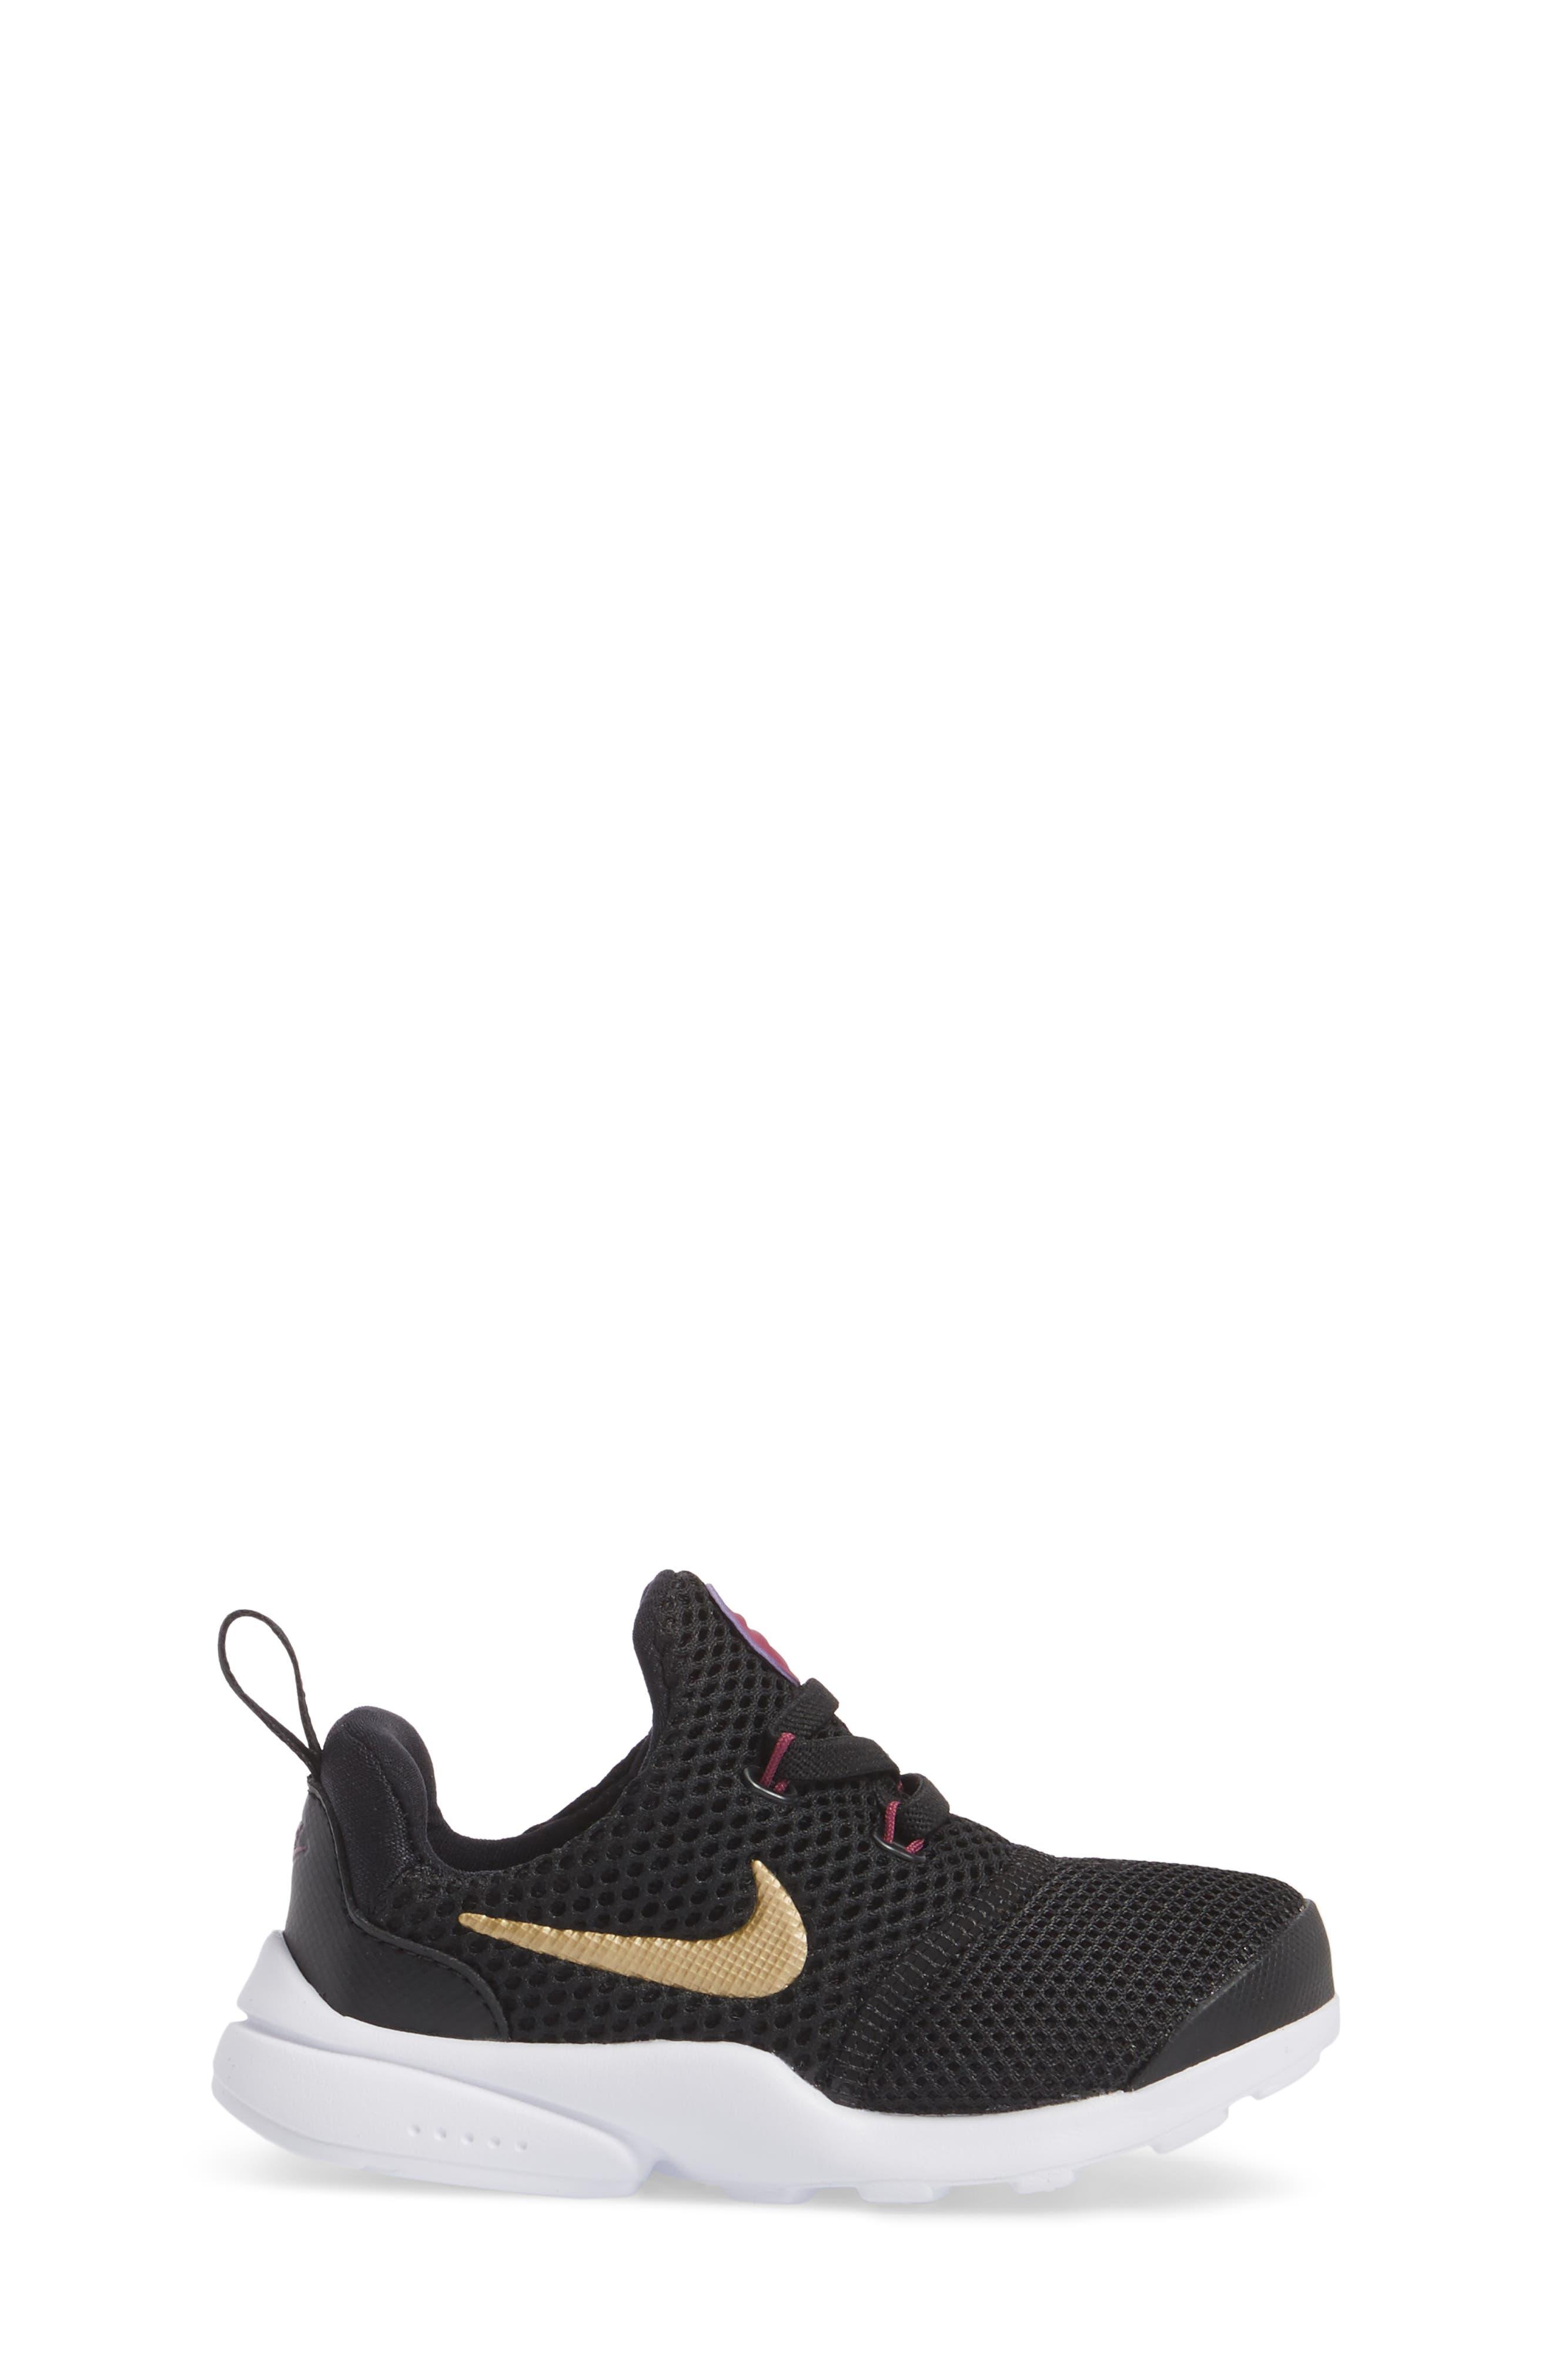 Presto Fly Sneaker,                             Alternate thumbnail 3, color,                             Black/ Gold